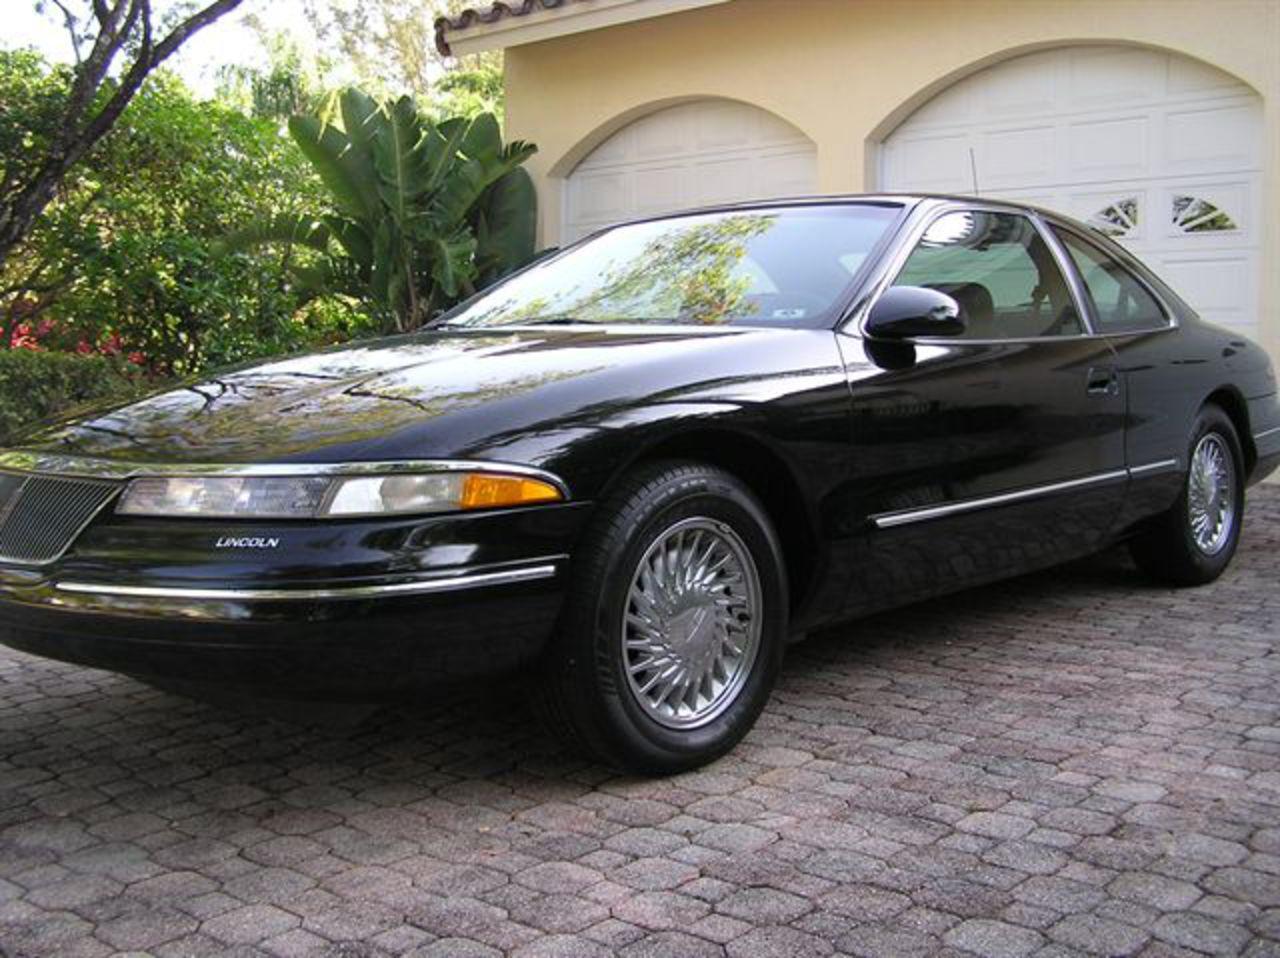 Topworldauto Photos Of Lincoln Mark Viii Photo Galleries 1996 8 Engine Diagram Makemodel Color Black Year 1994 Mileage 142000